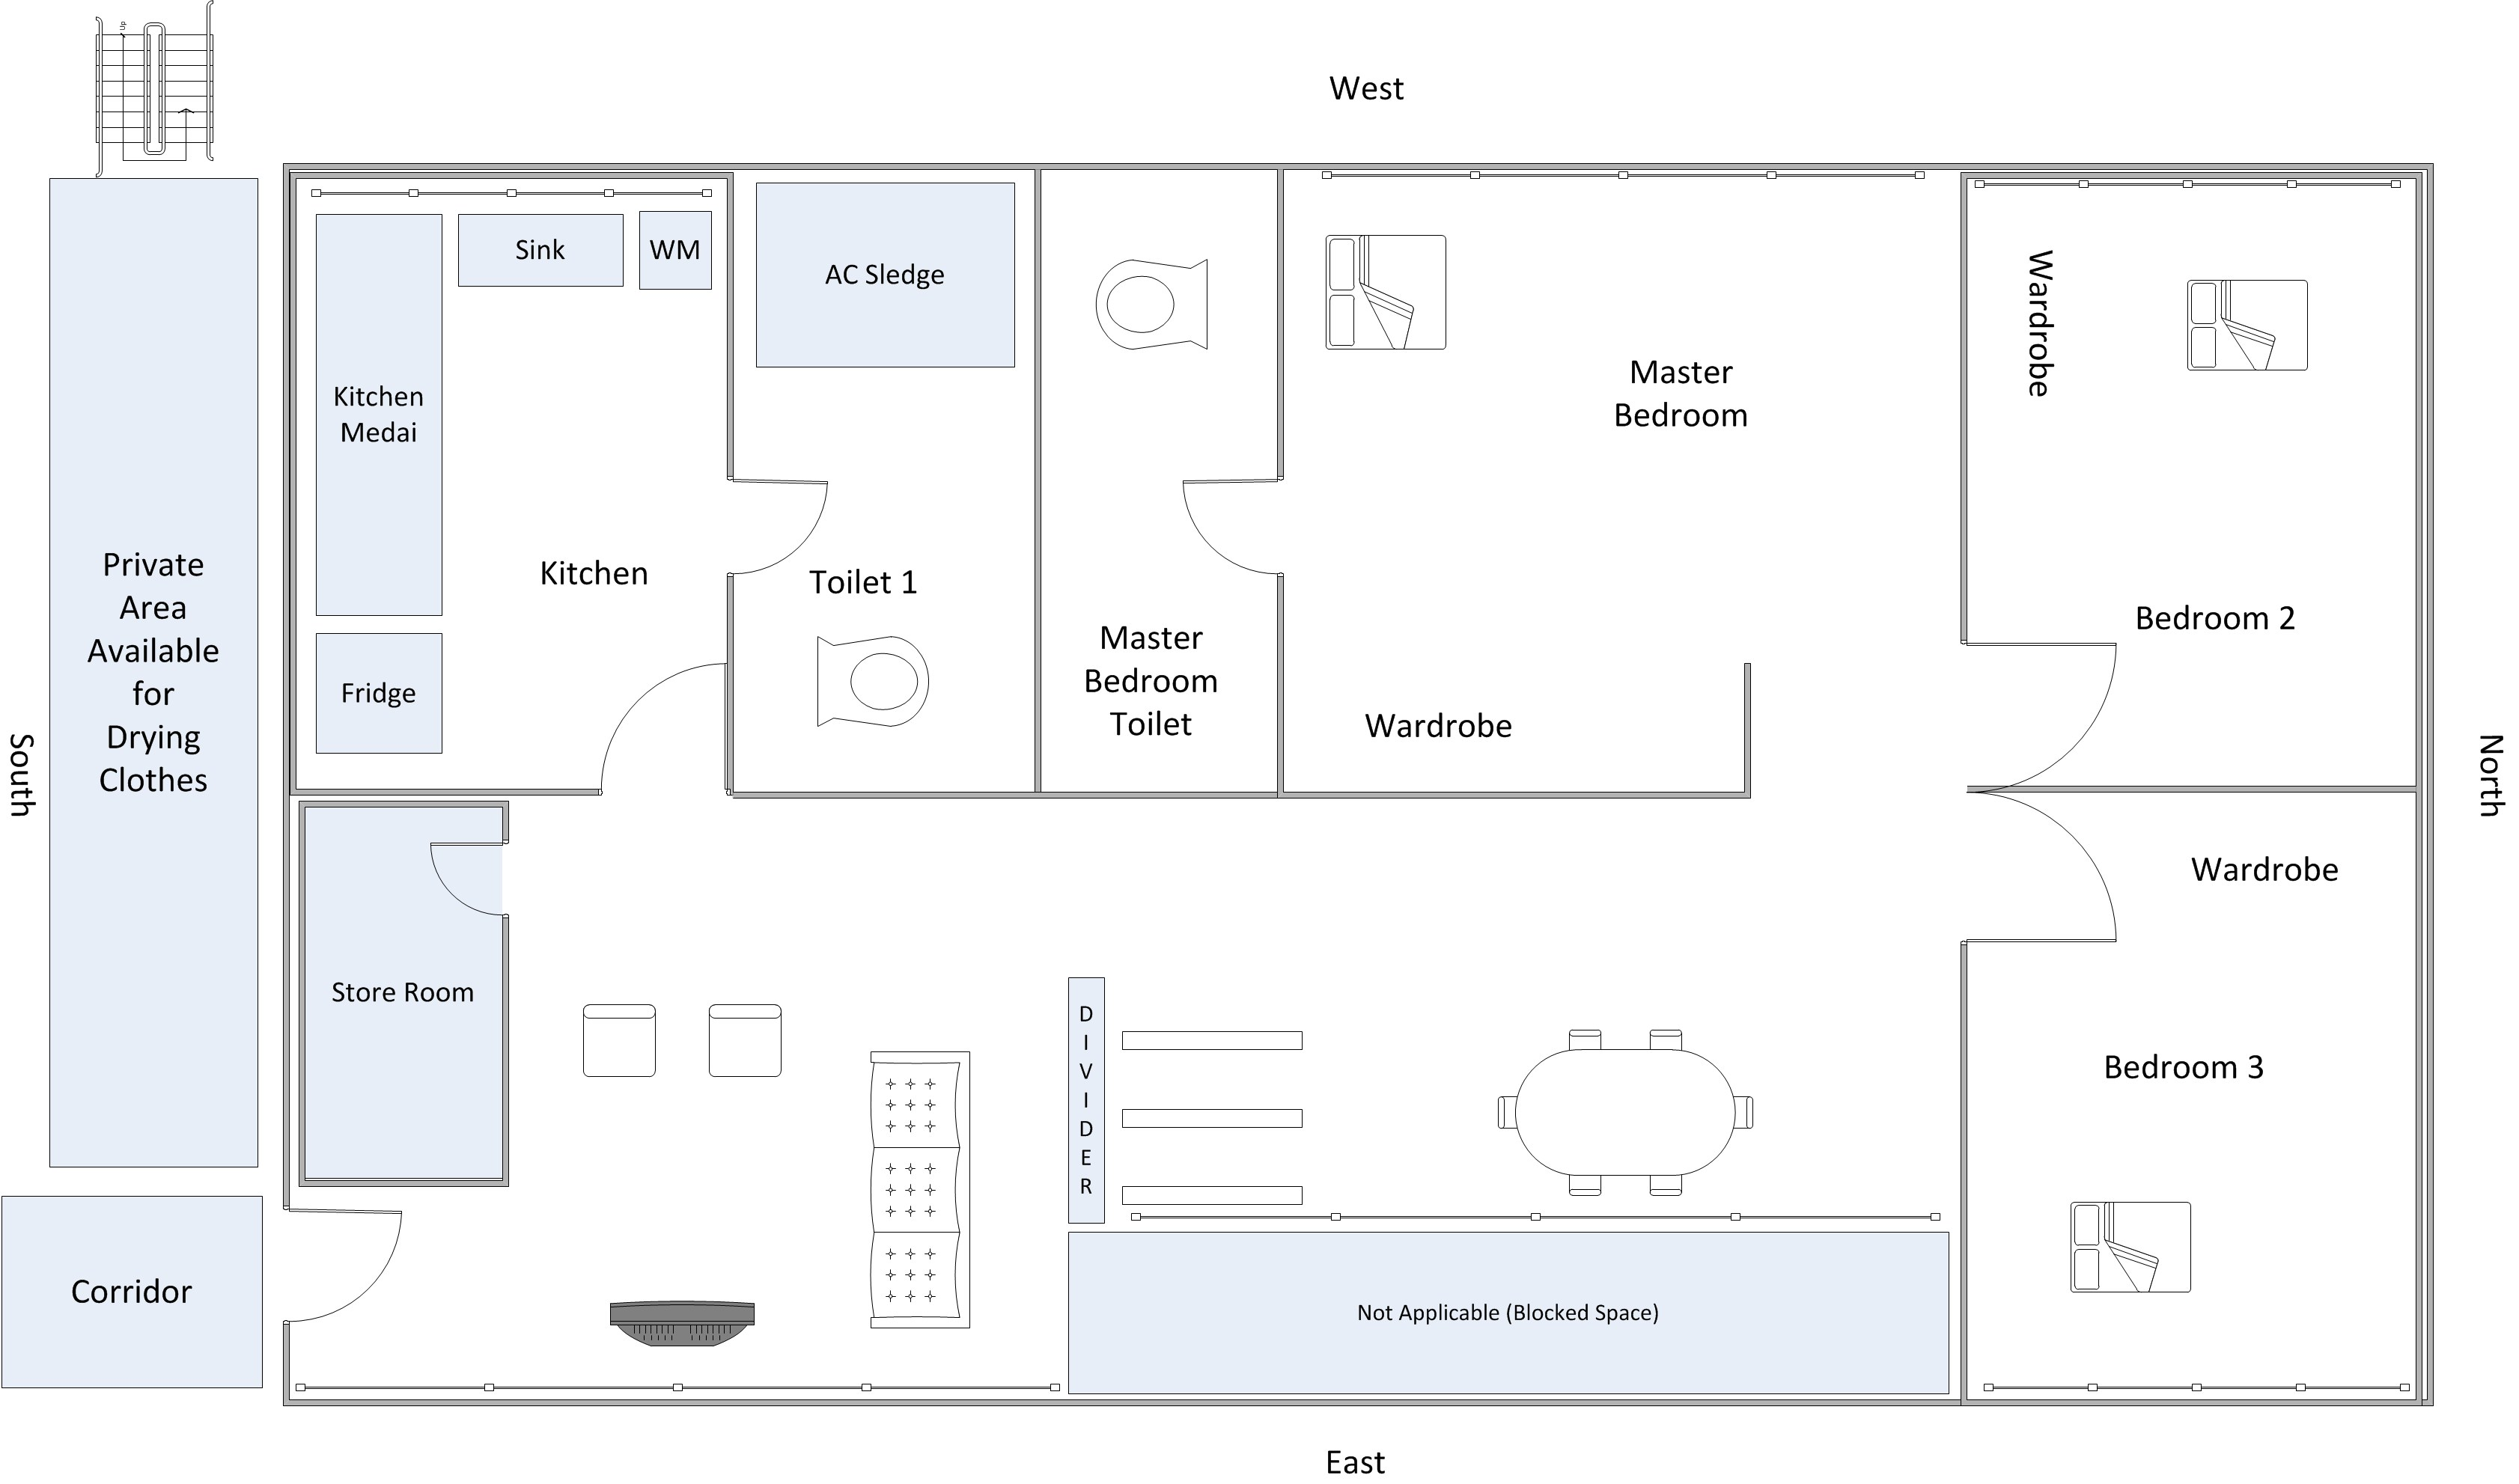 southwest kitchen valances curtains vastu for se facing home sw attachments blk700b floorplan jpg on thu jun 28 2012 n